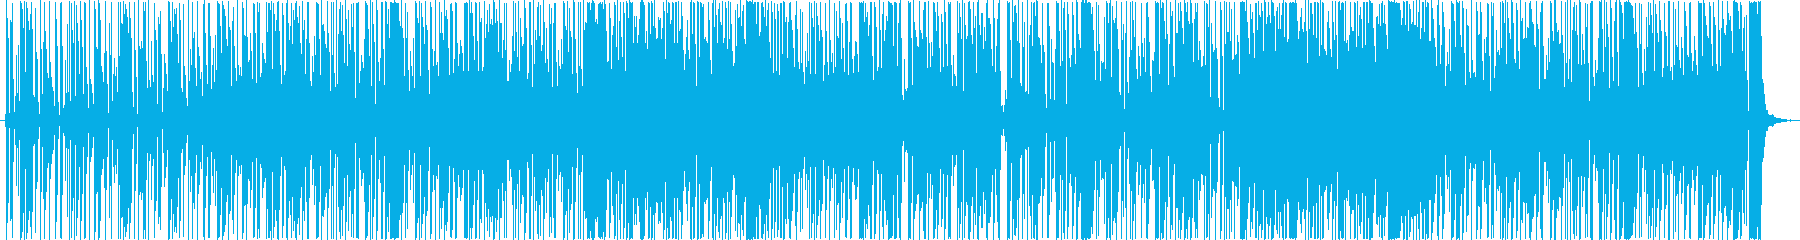 James Brown、Maceo...の再生済みの波形